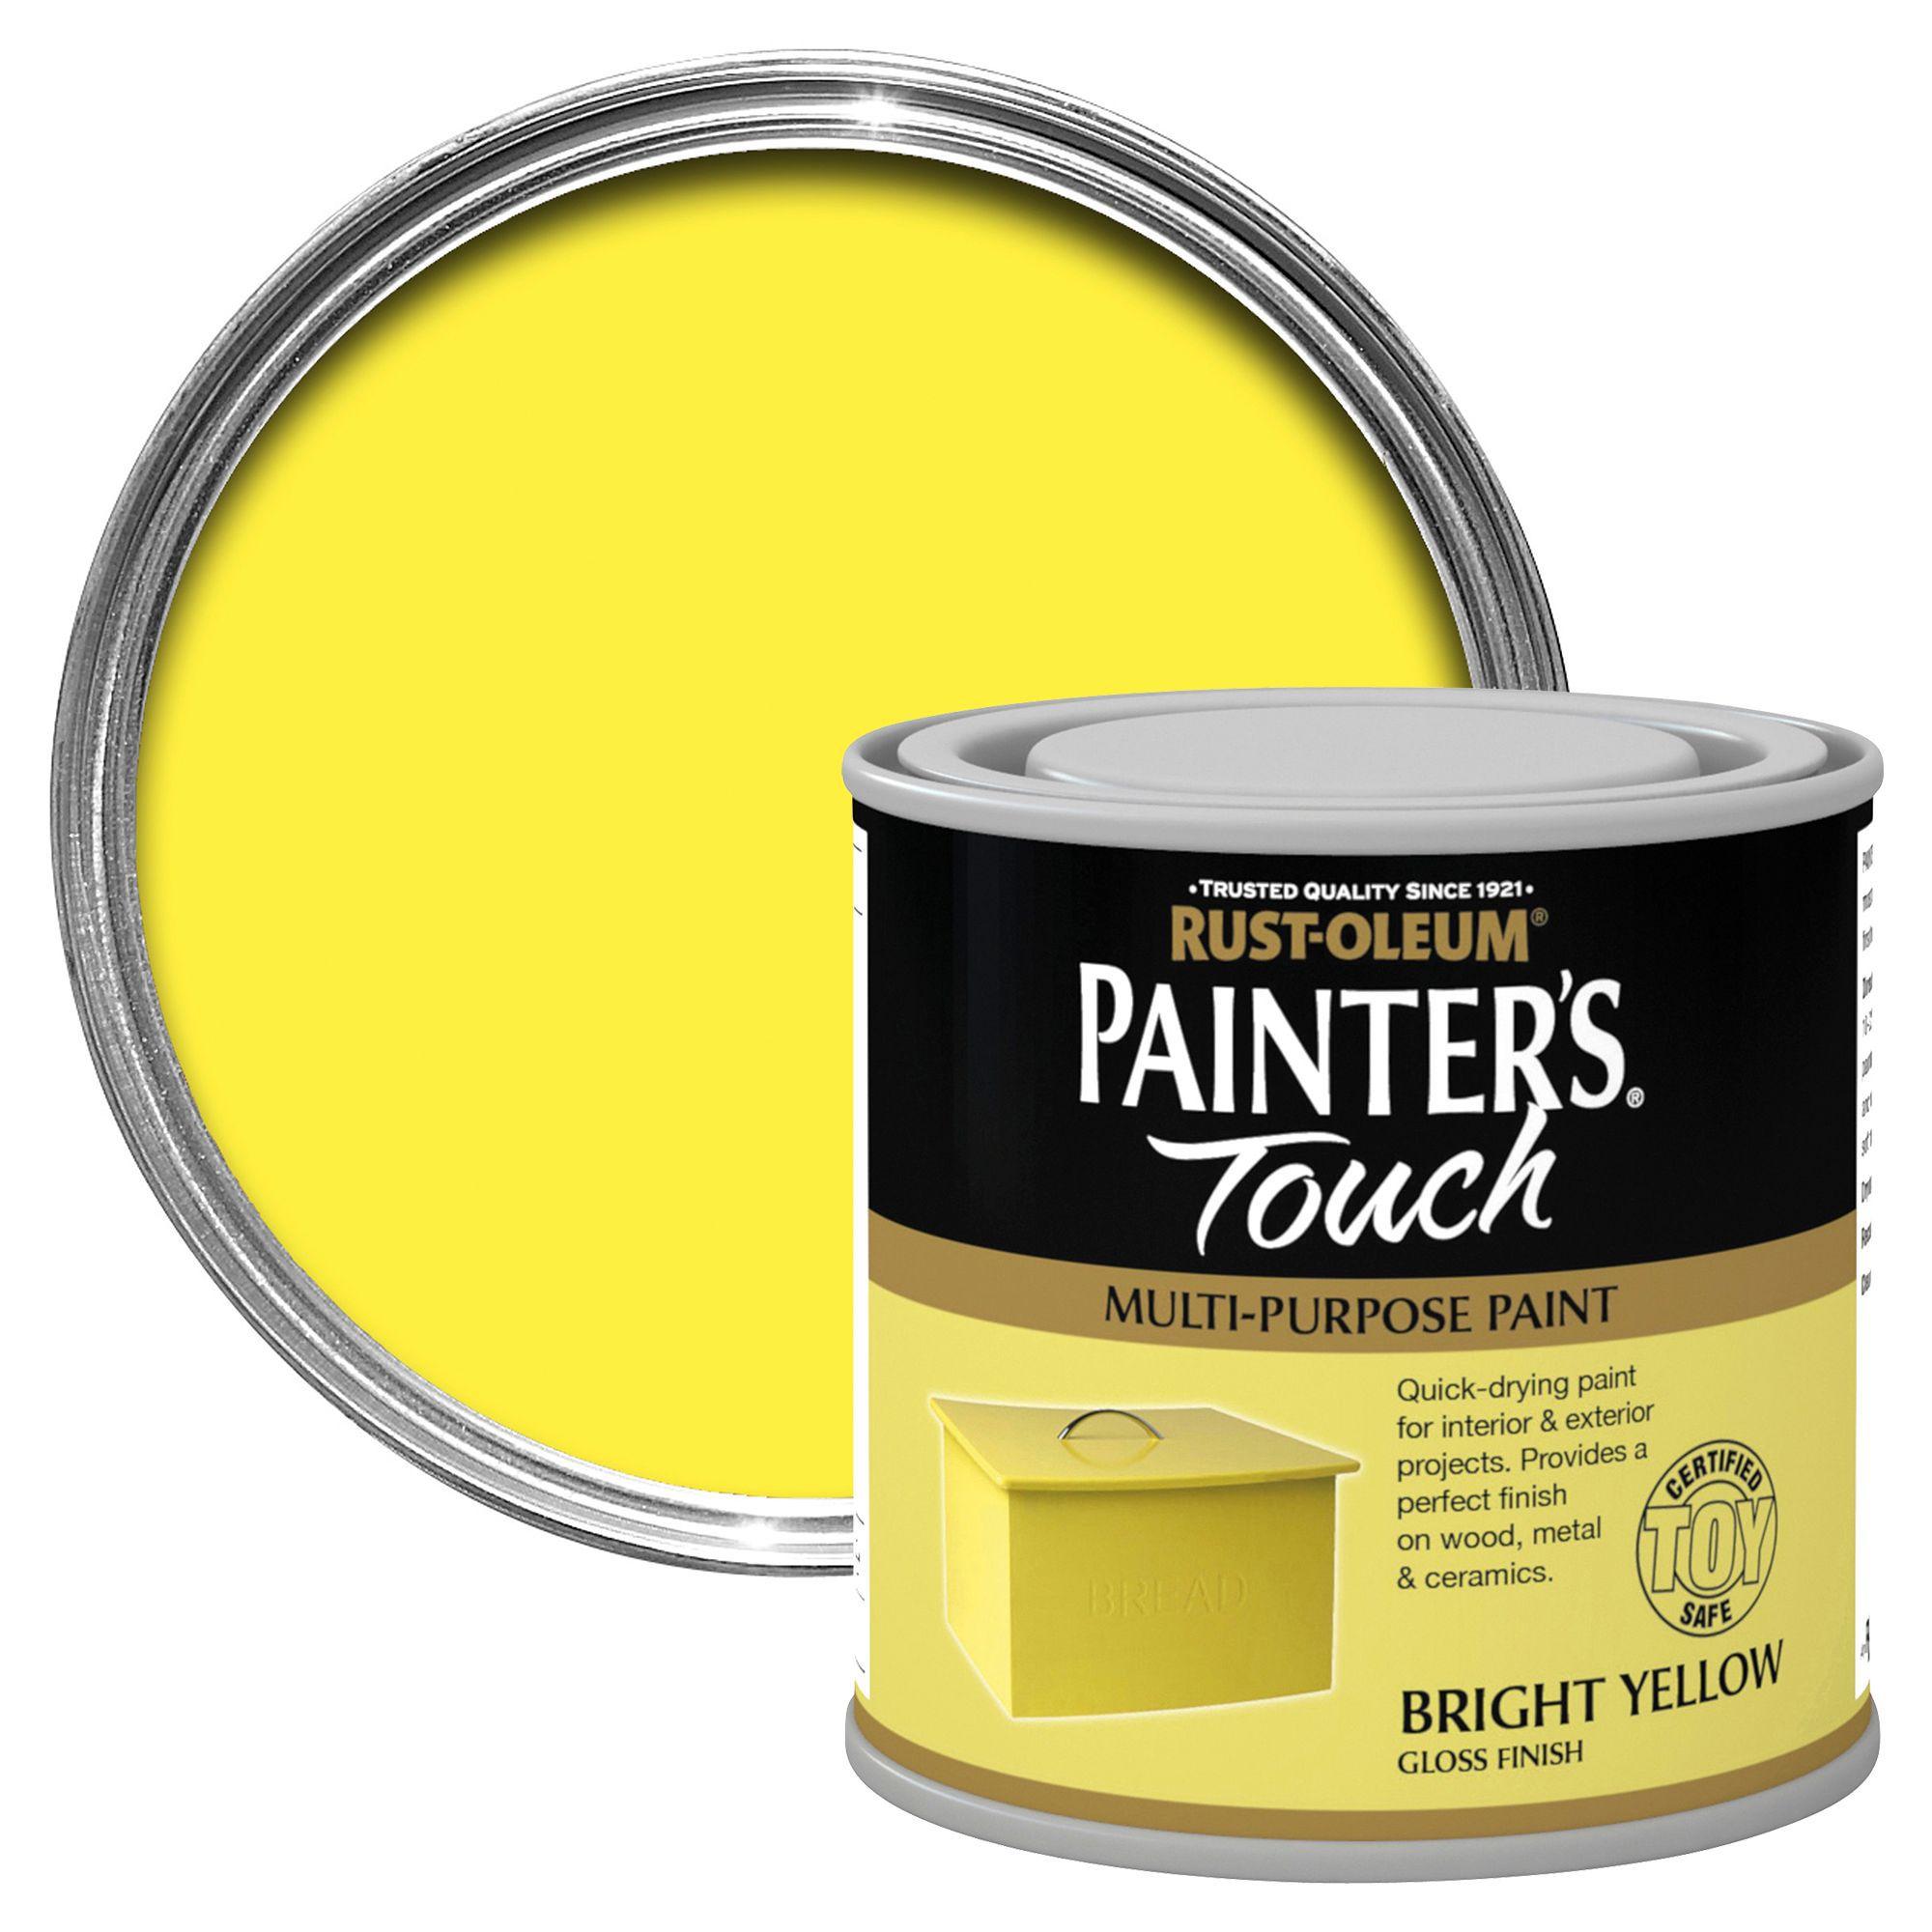 Rust-oleum Painter's Touch Interior & Exterior Bright Yellow Gloss Multipurpose Paint 250ml